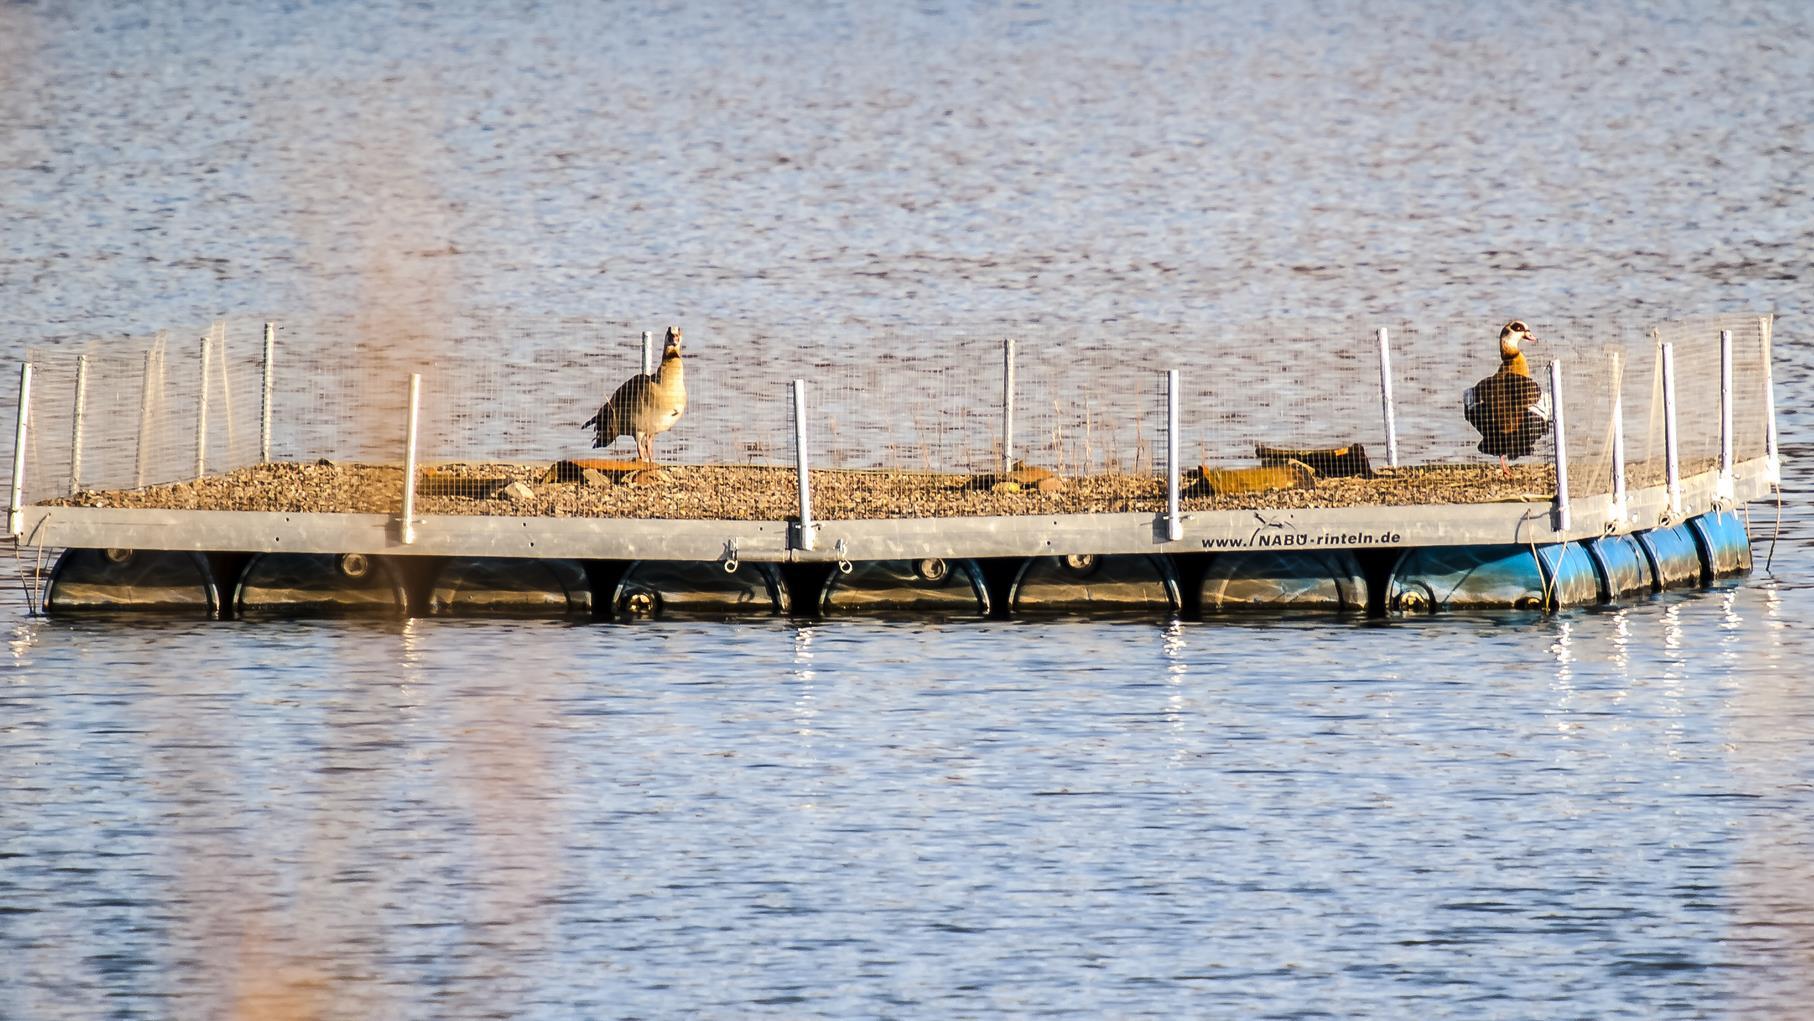 Zwei Nilgänse haben das Flussseeschwalbenfloß entdeckt.